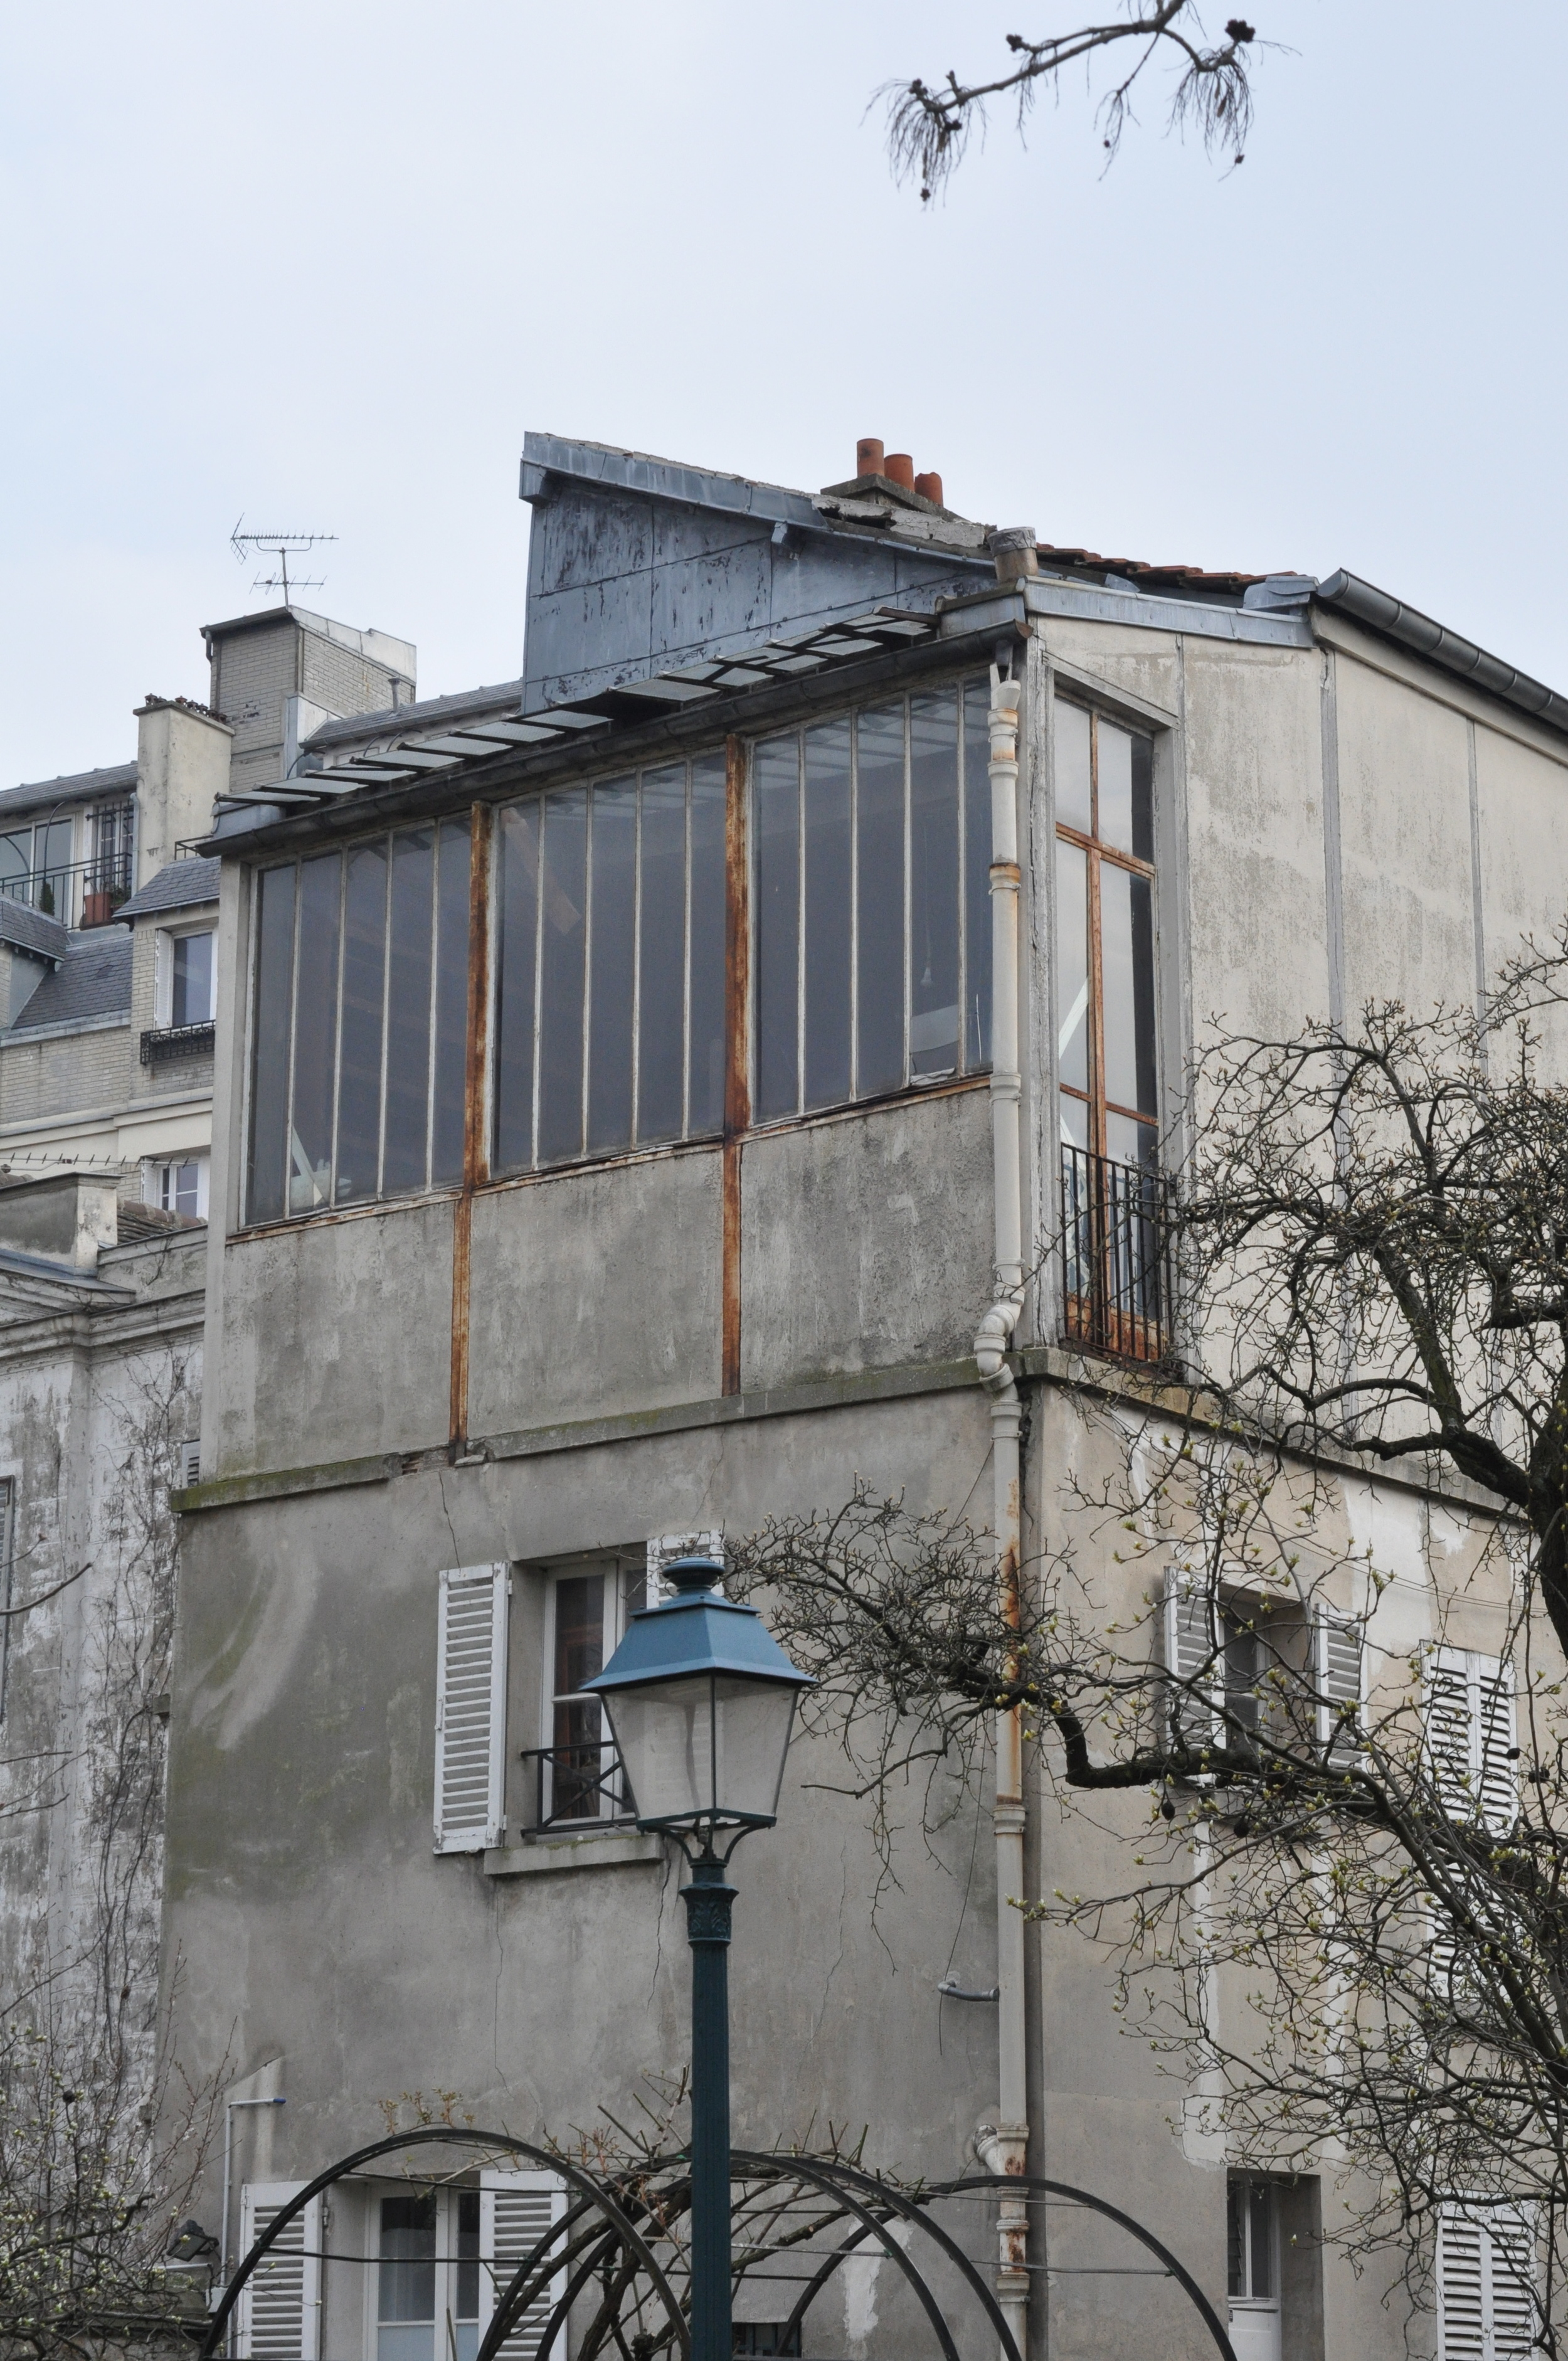 artist studios at montmartre musee